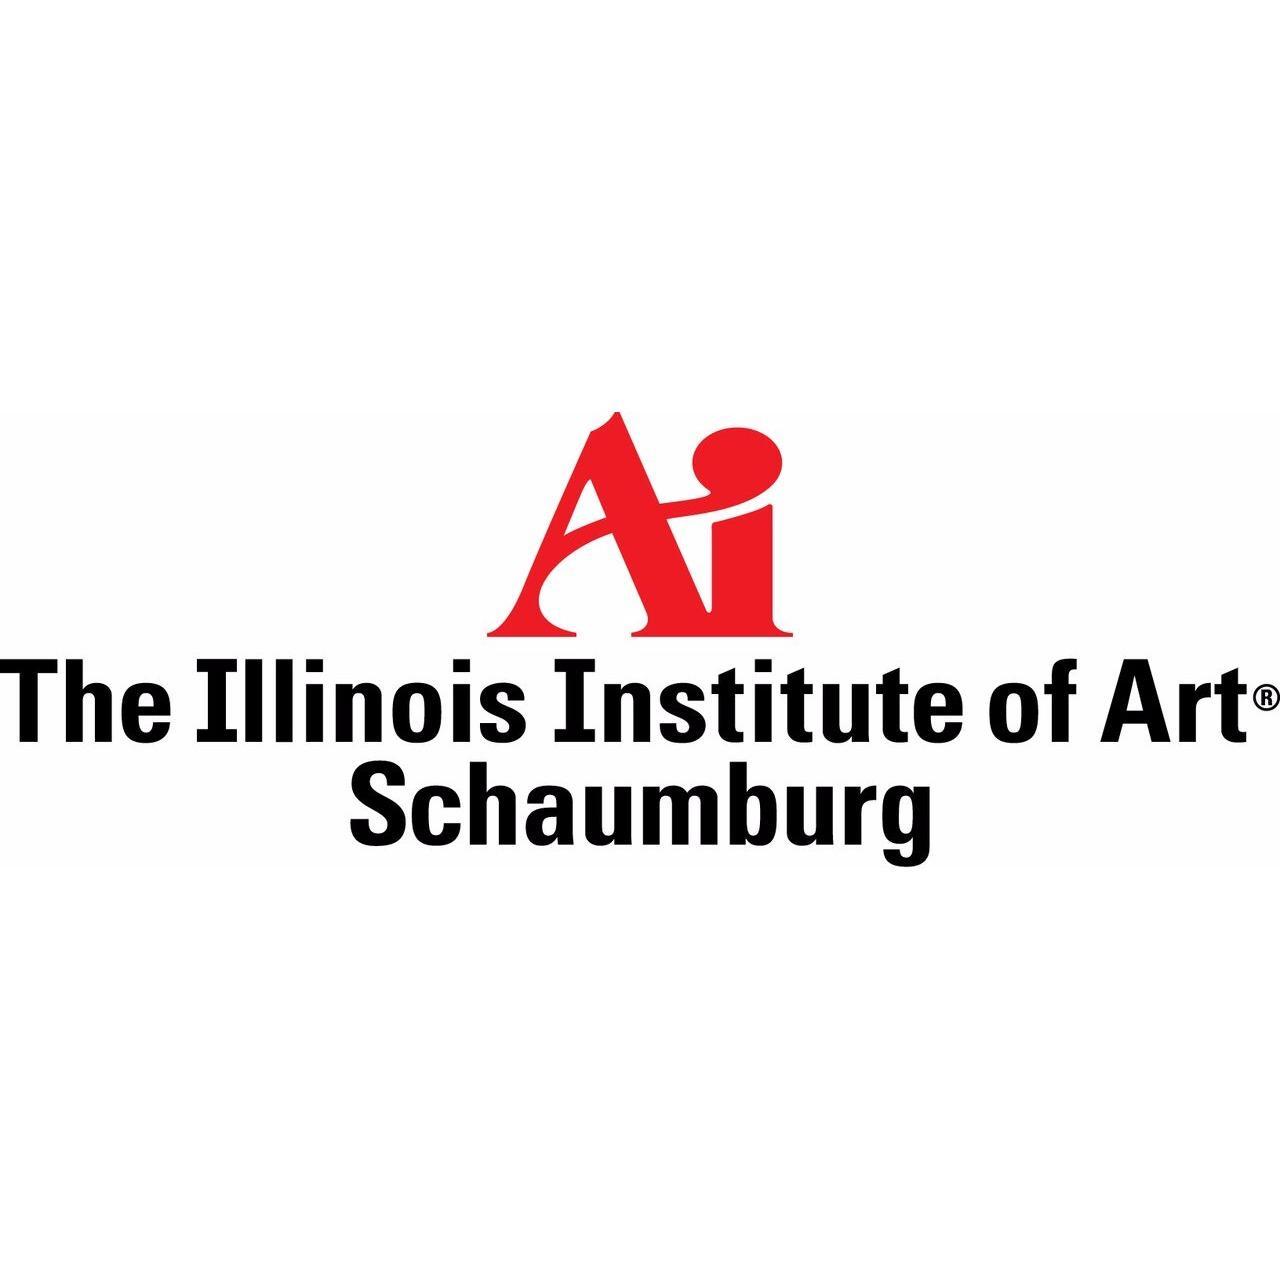 The Illinois Institute of Art - Schaumburg image 5